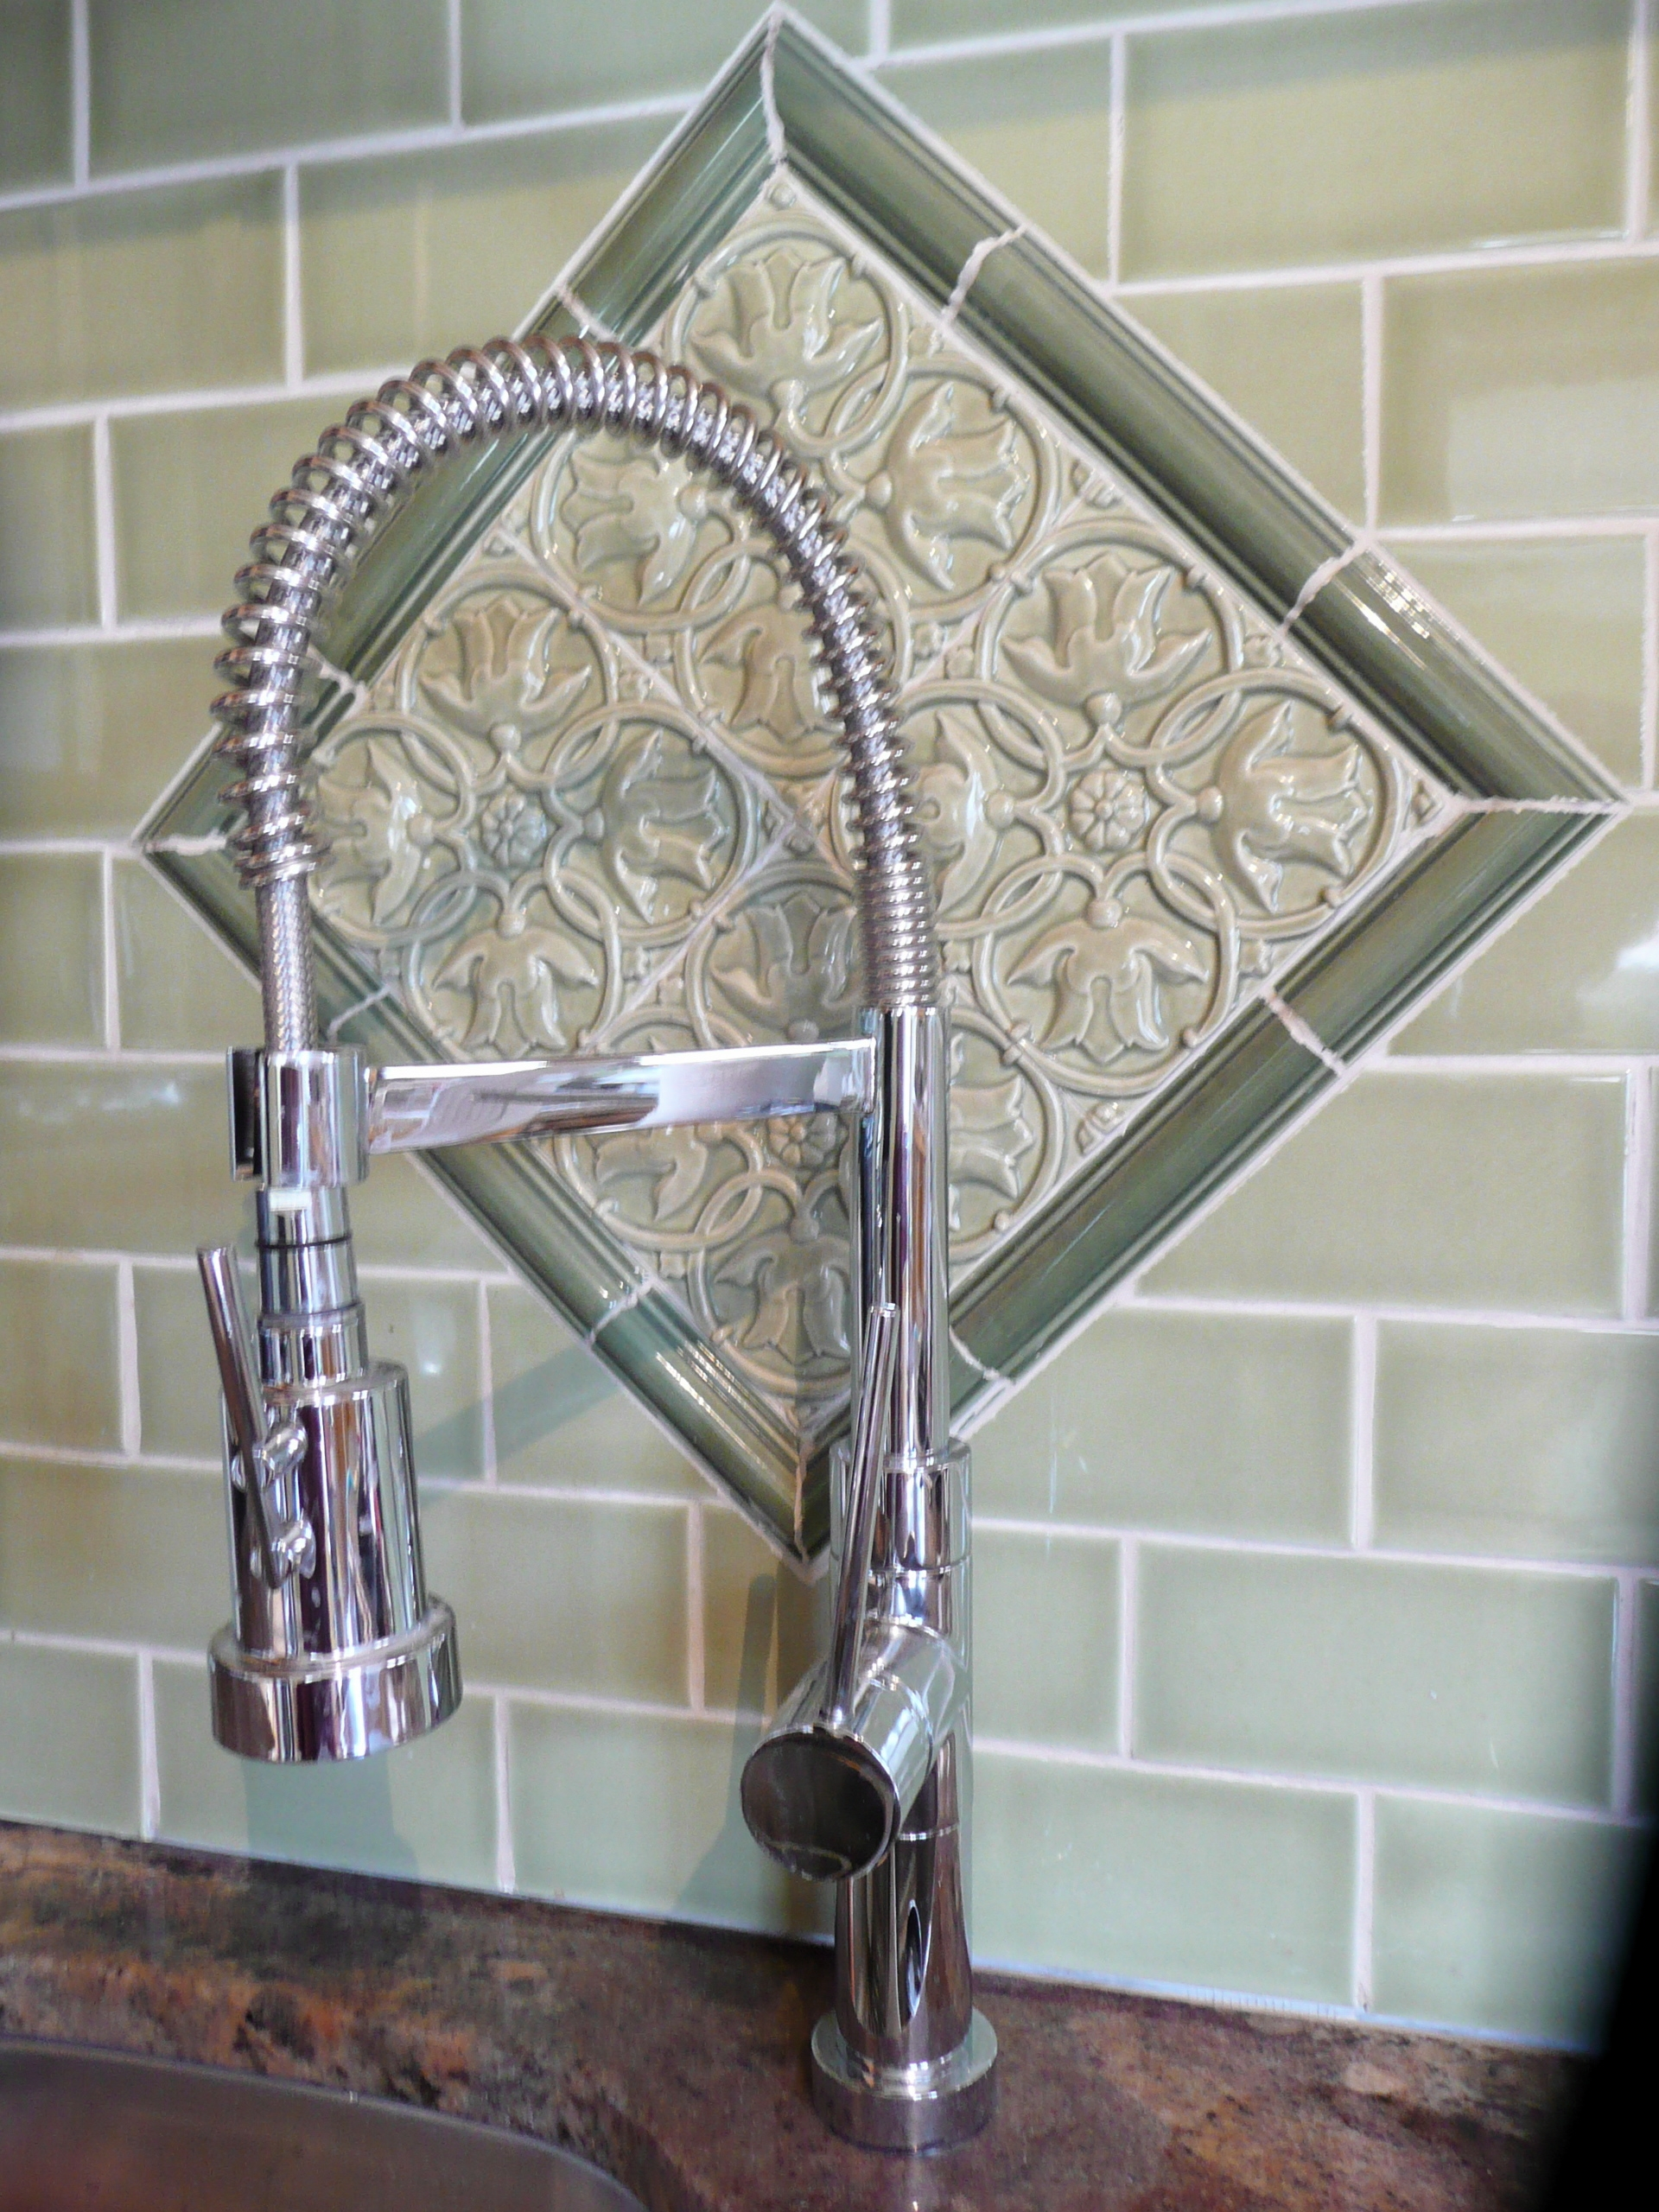 Ideas, restaurant type kitchen faucets restaurant type kitchen faucets restaurant style kitchen faucet bjyoho 1920 x 2560  .